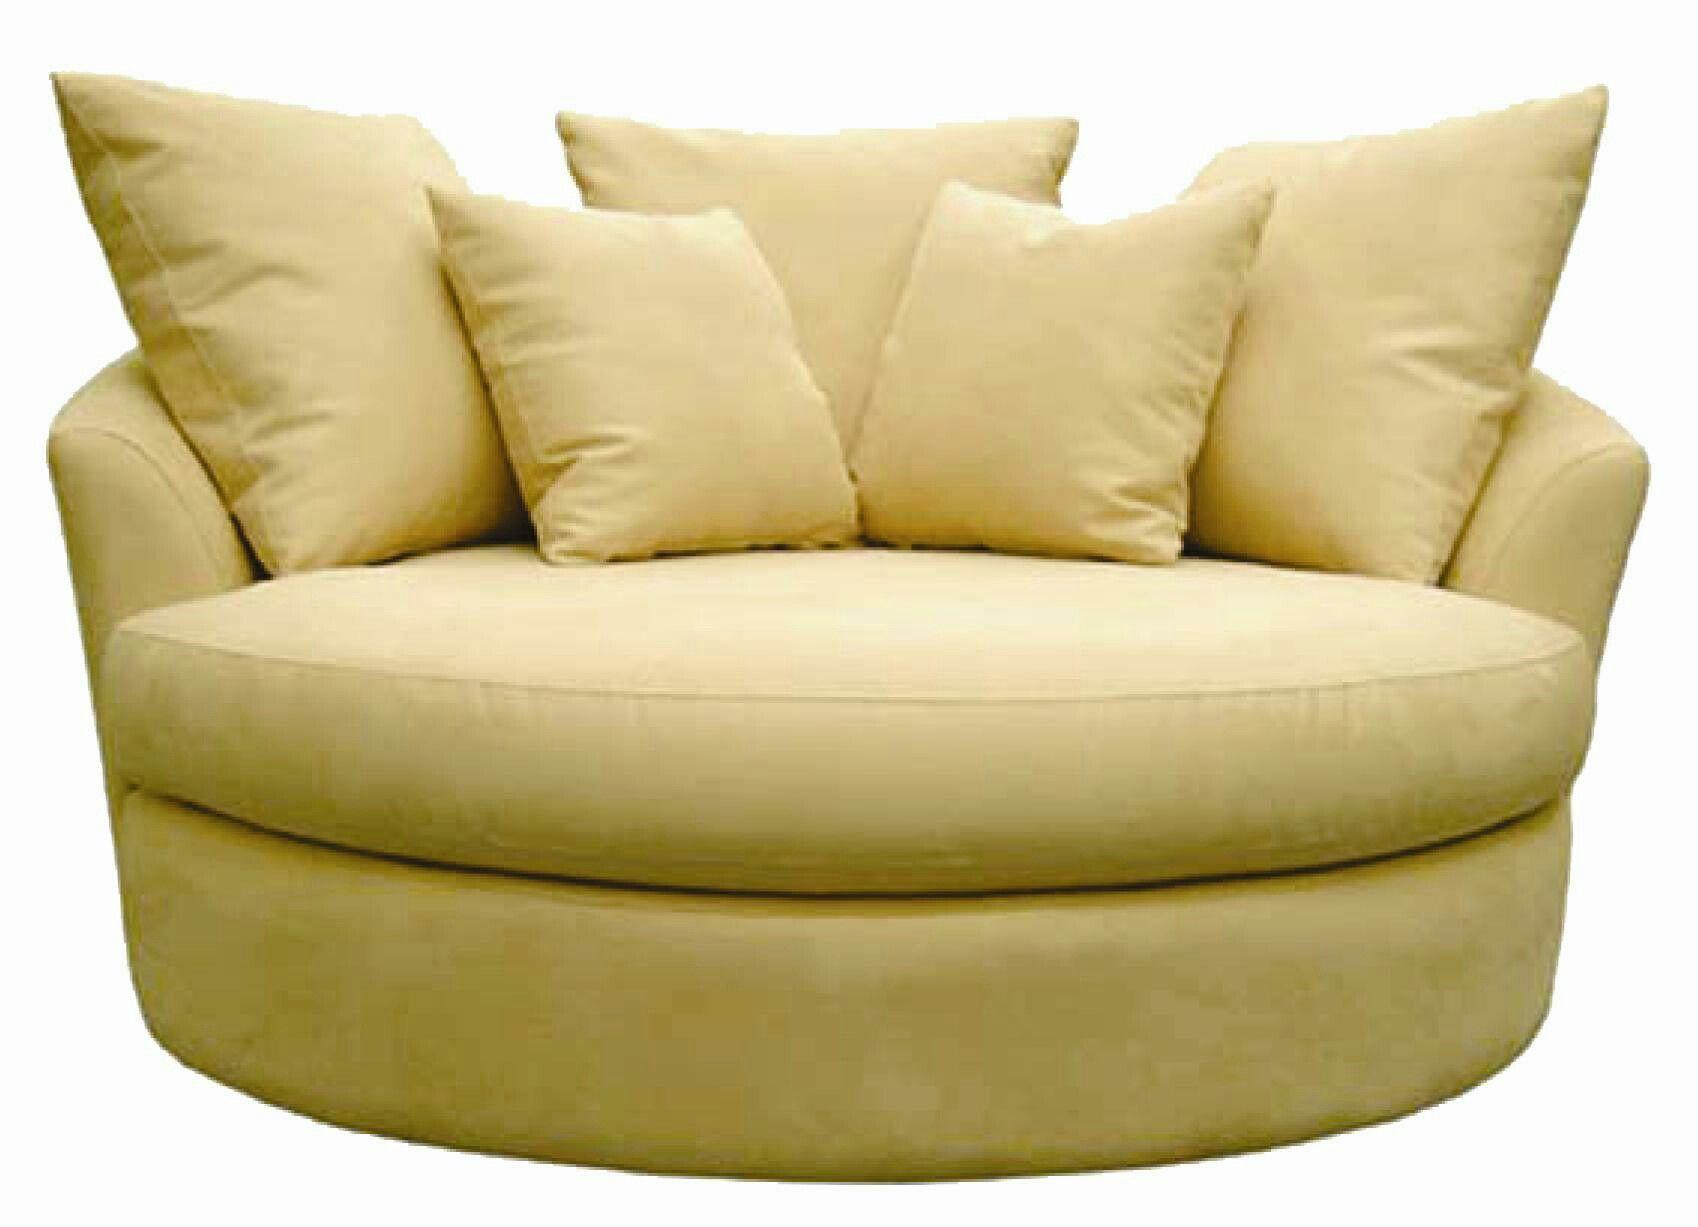 pin by felicia jackson on beautiful furniture | pinterest